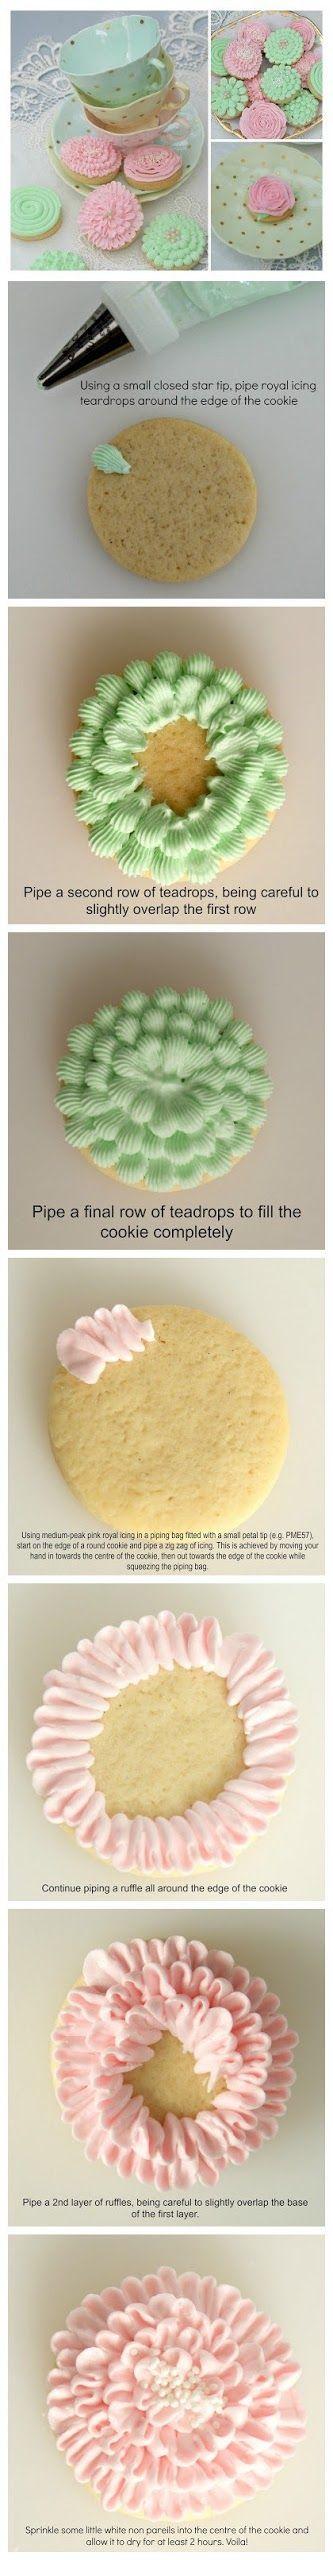 cookglee recipe pictures: Springtime Cookies